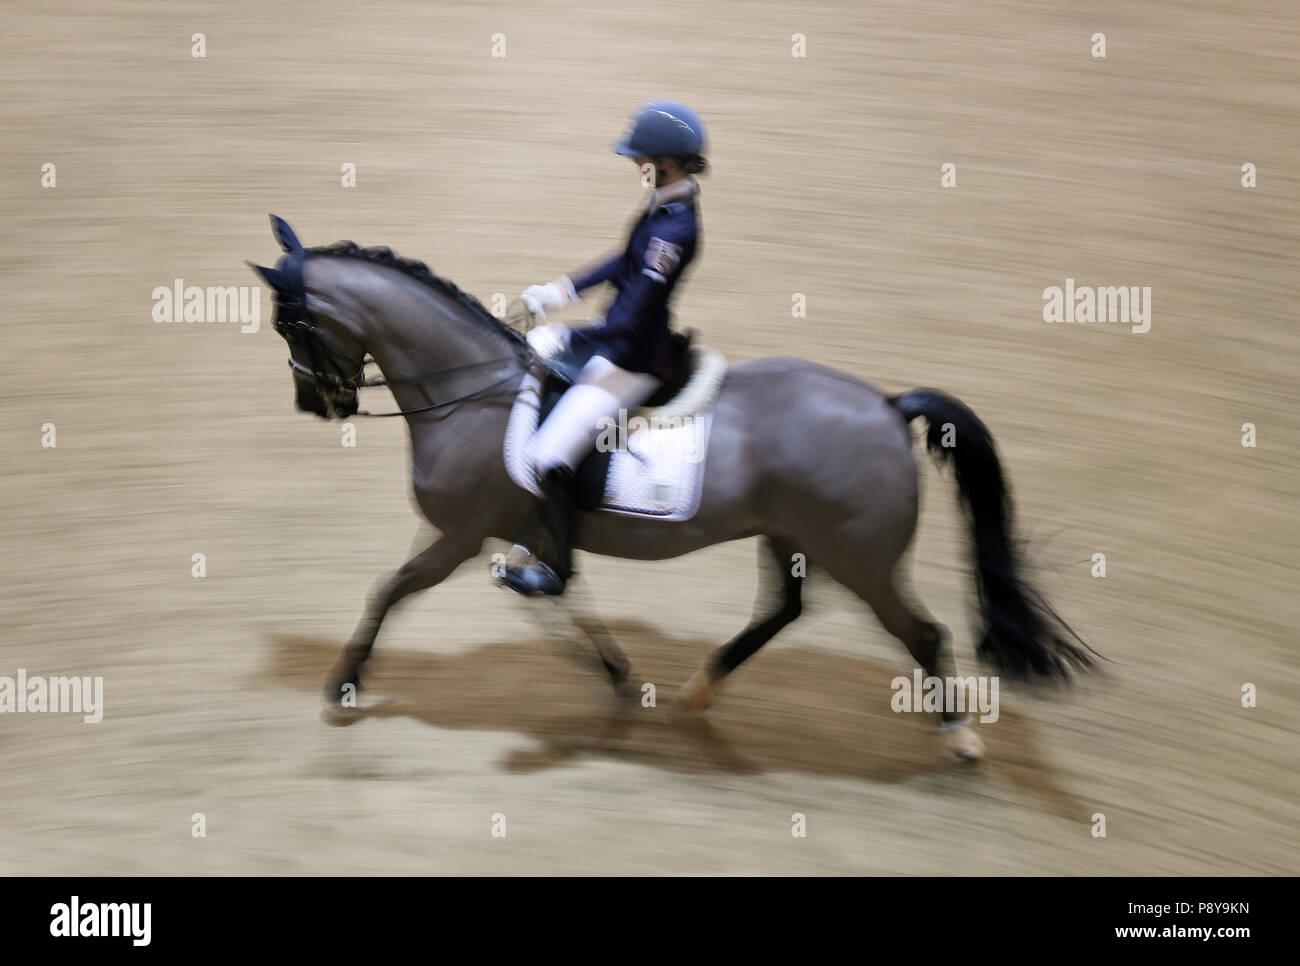 Berlín, Dynamics, doma, caballo y jinete, trote Imagen De Stock